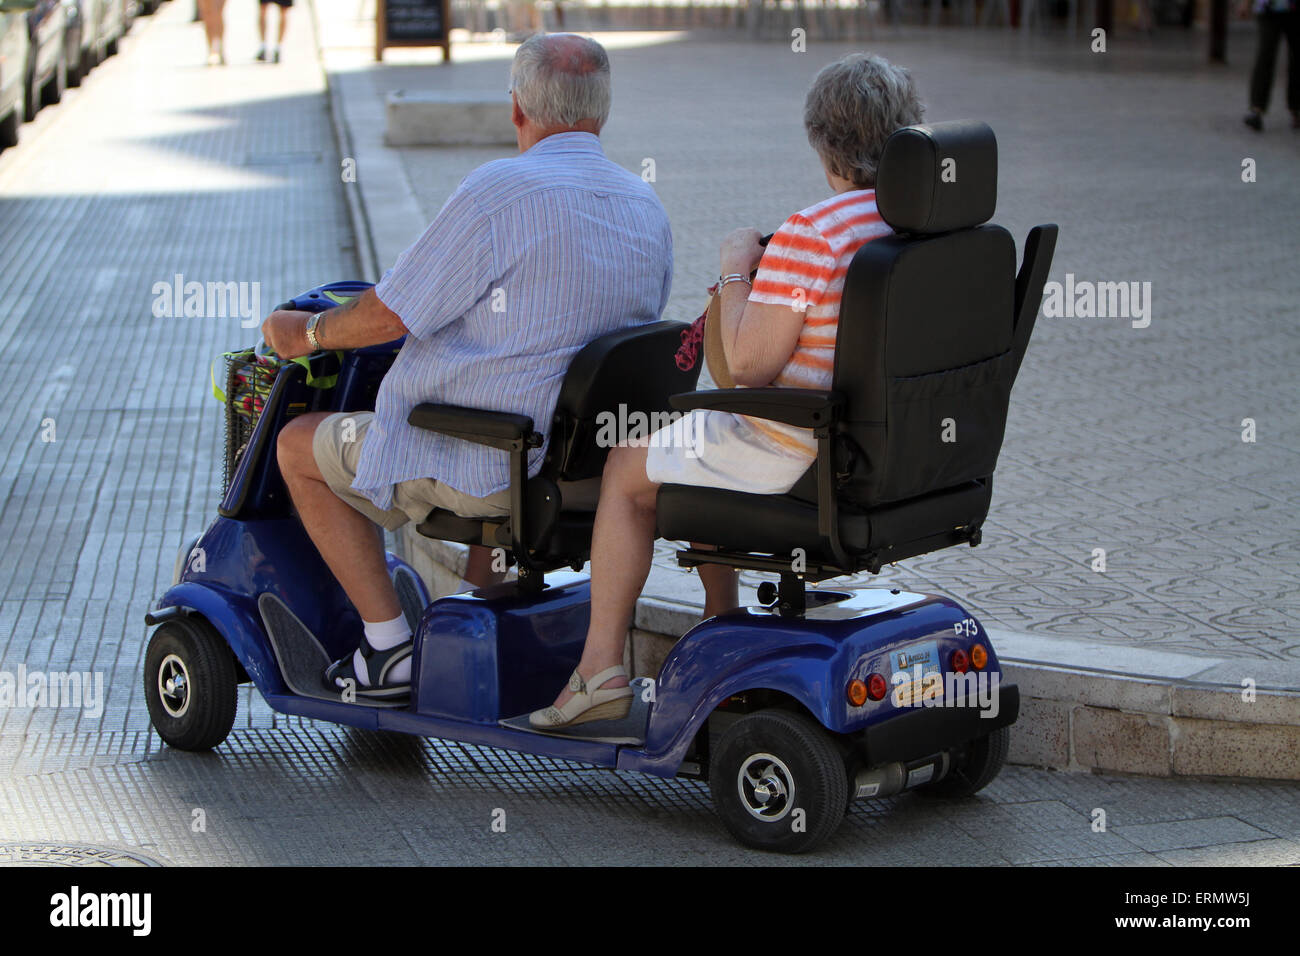 Elderly couple on mobility scooter tandem stock photo for Motorized cart for seniors